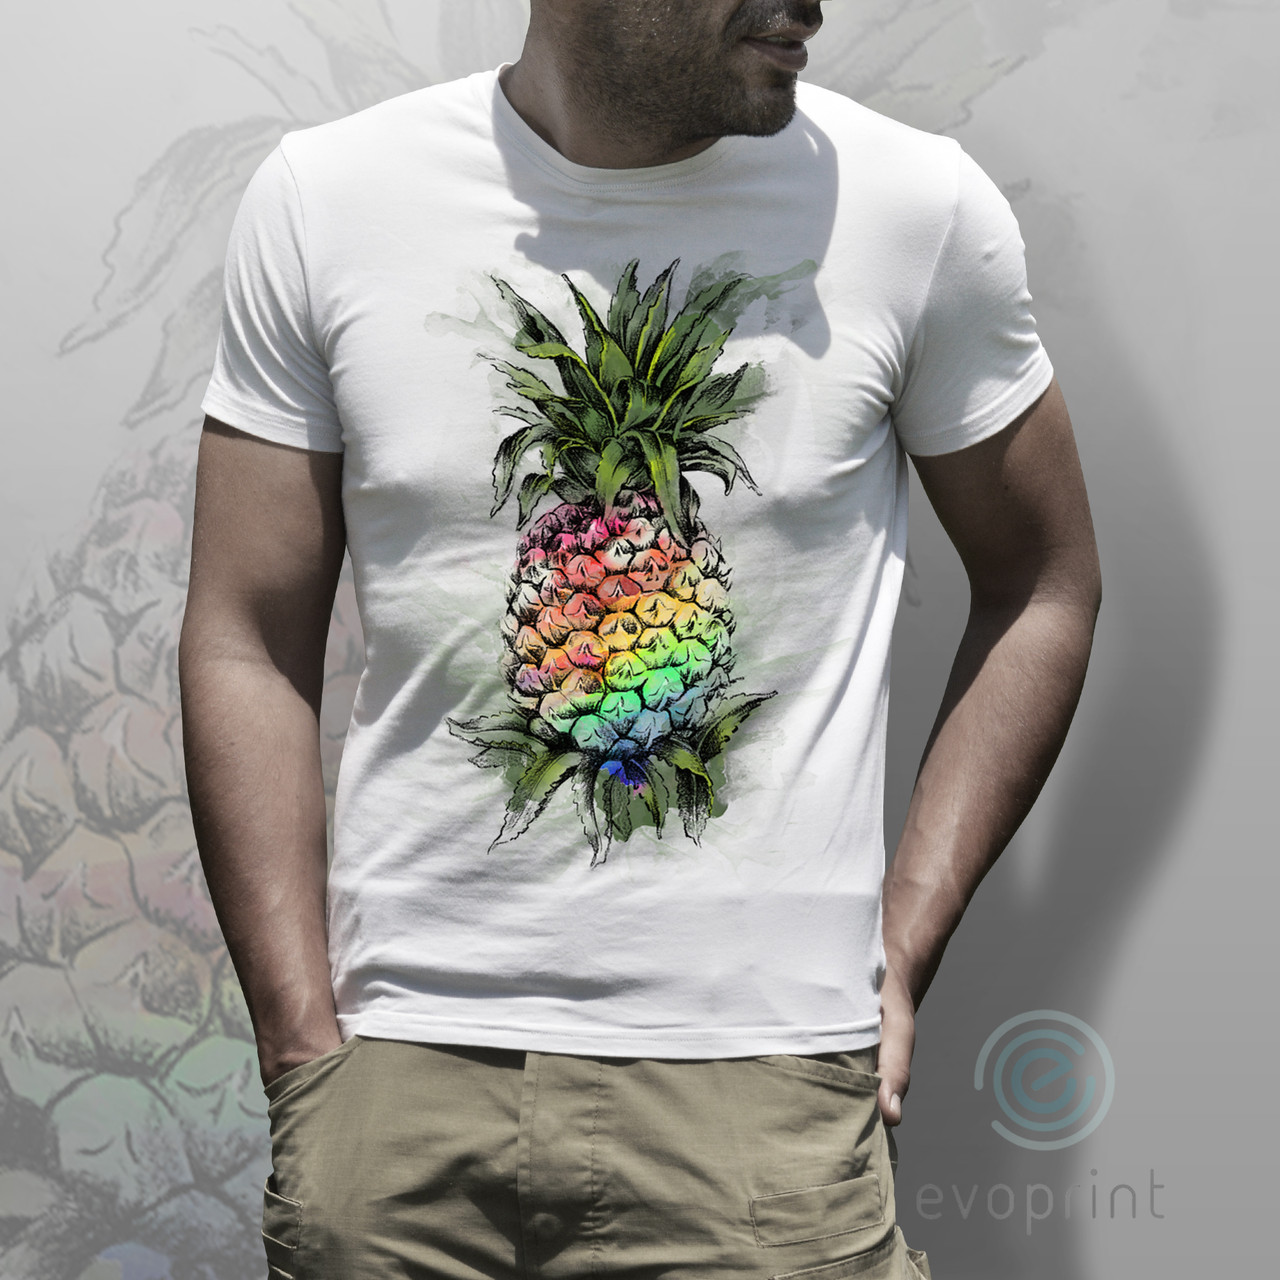 Услуги печати принтов на футболки